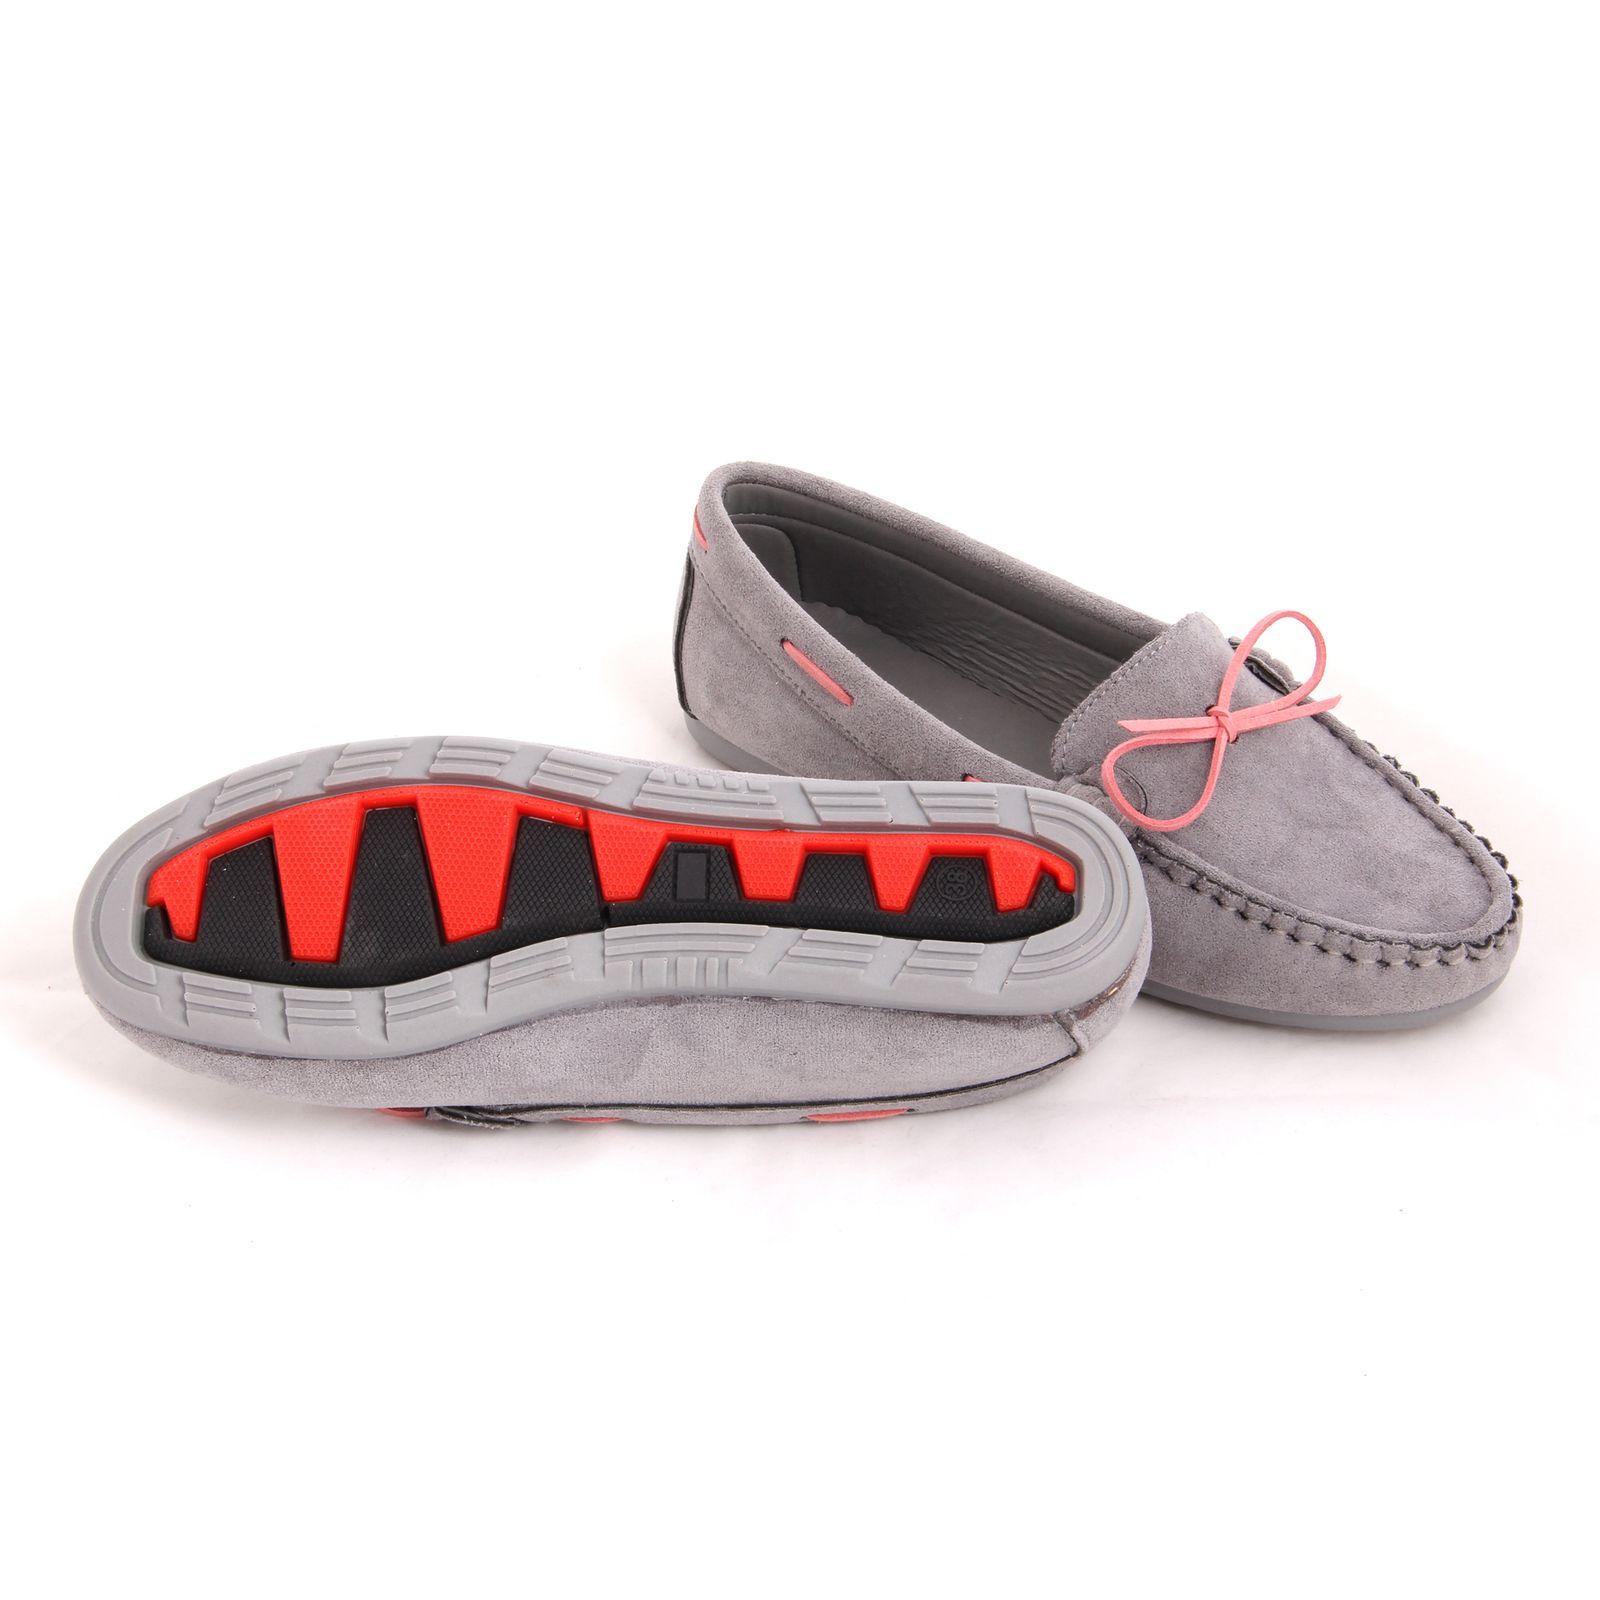 کفش روزمره زنانه کد 395 main 1 4